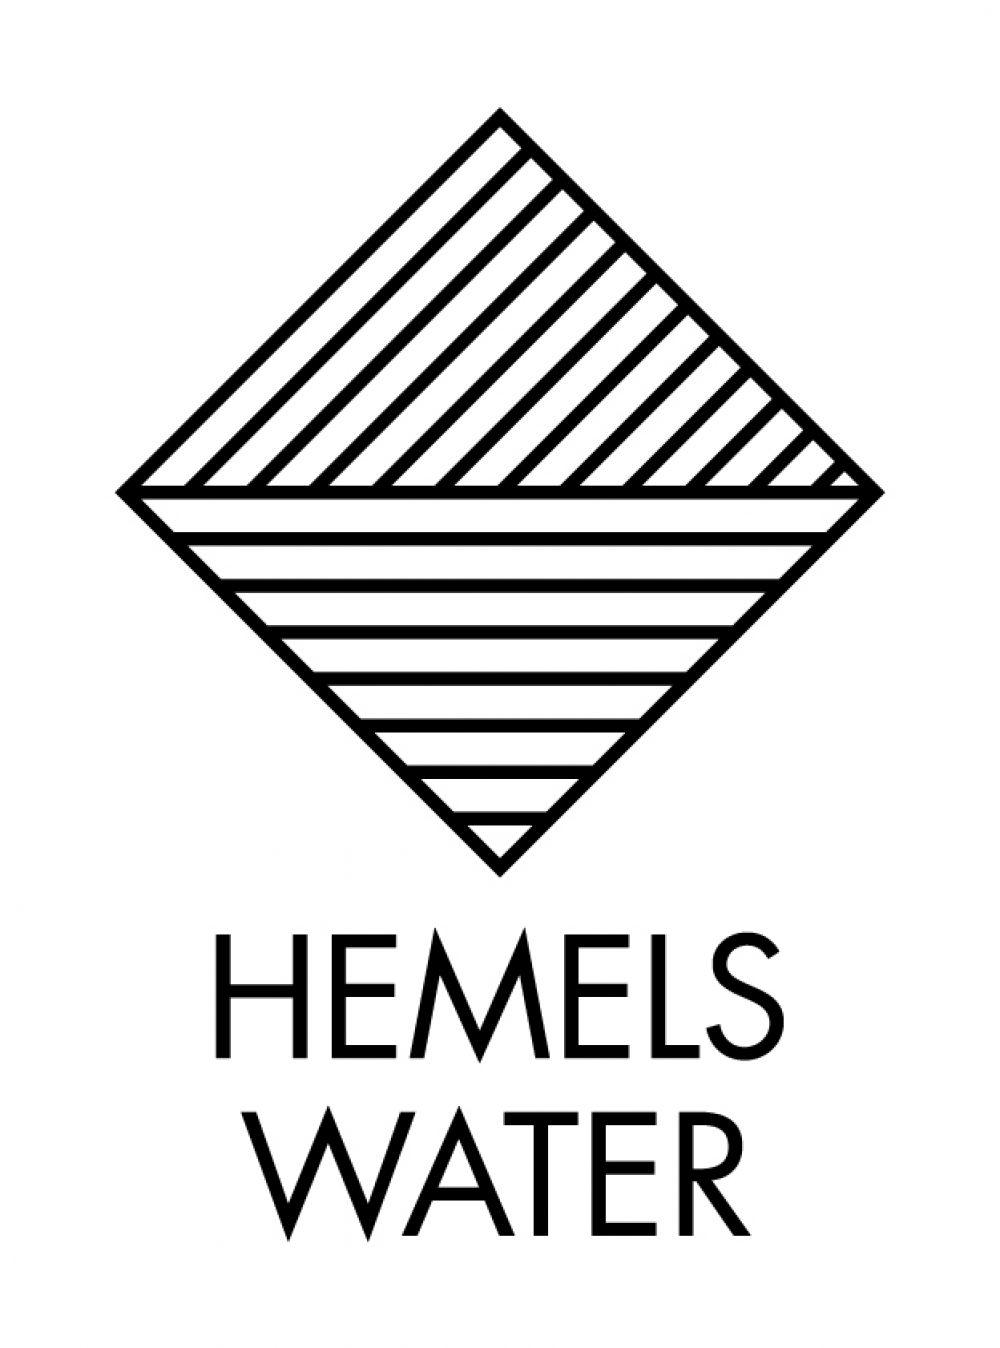 HEMELSWATER